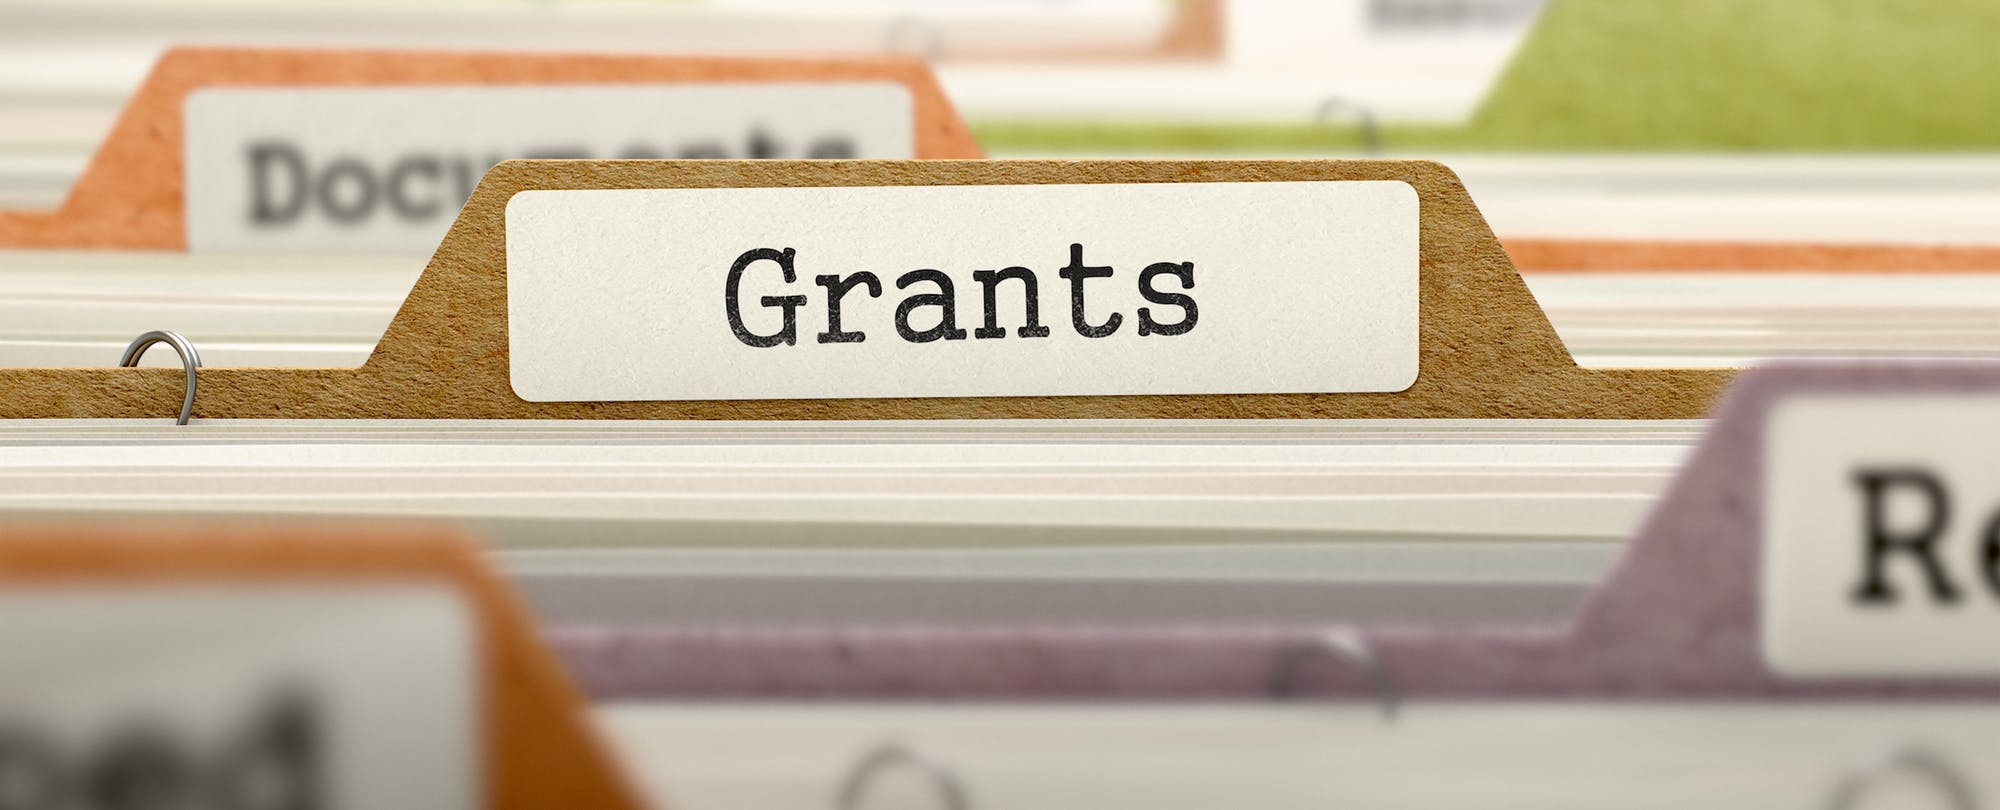 grants image